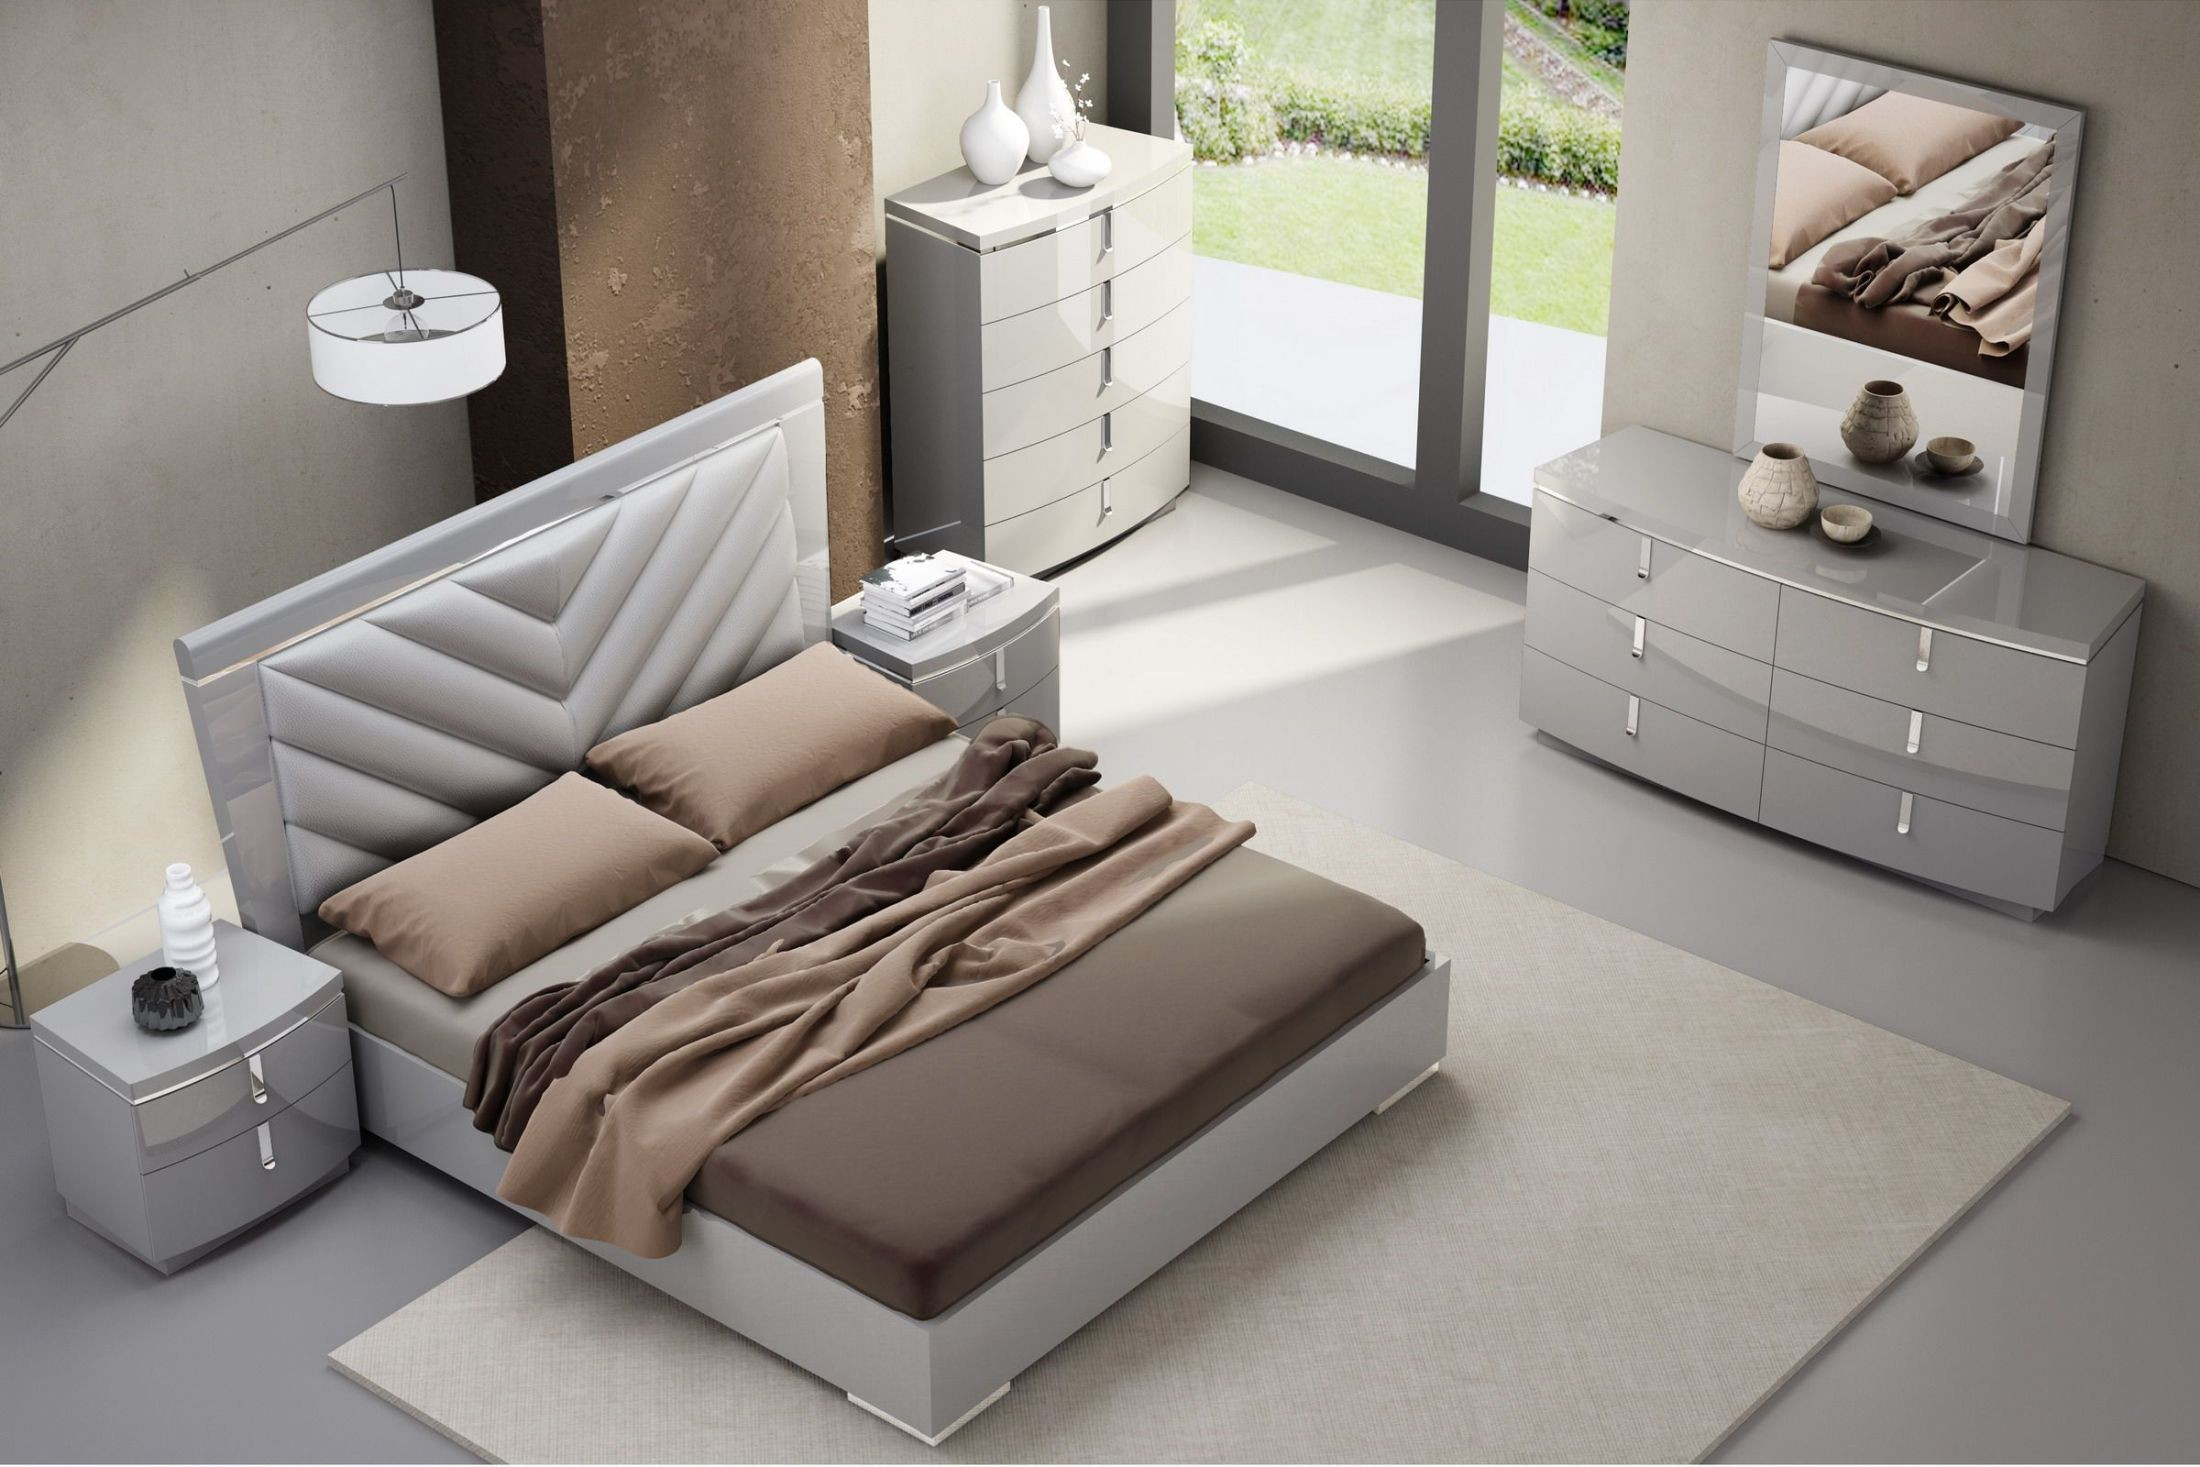 New York Gray Upholstered Platform Bedroom Set From JNM